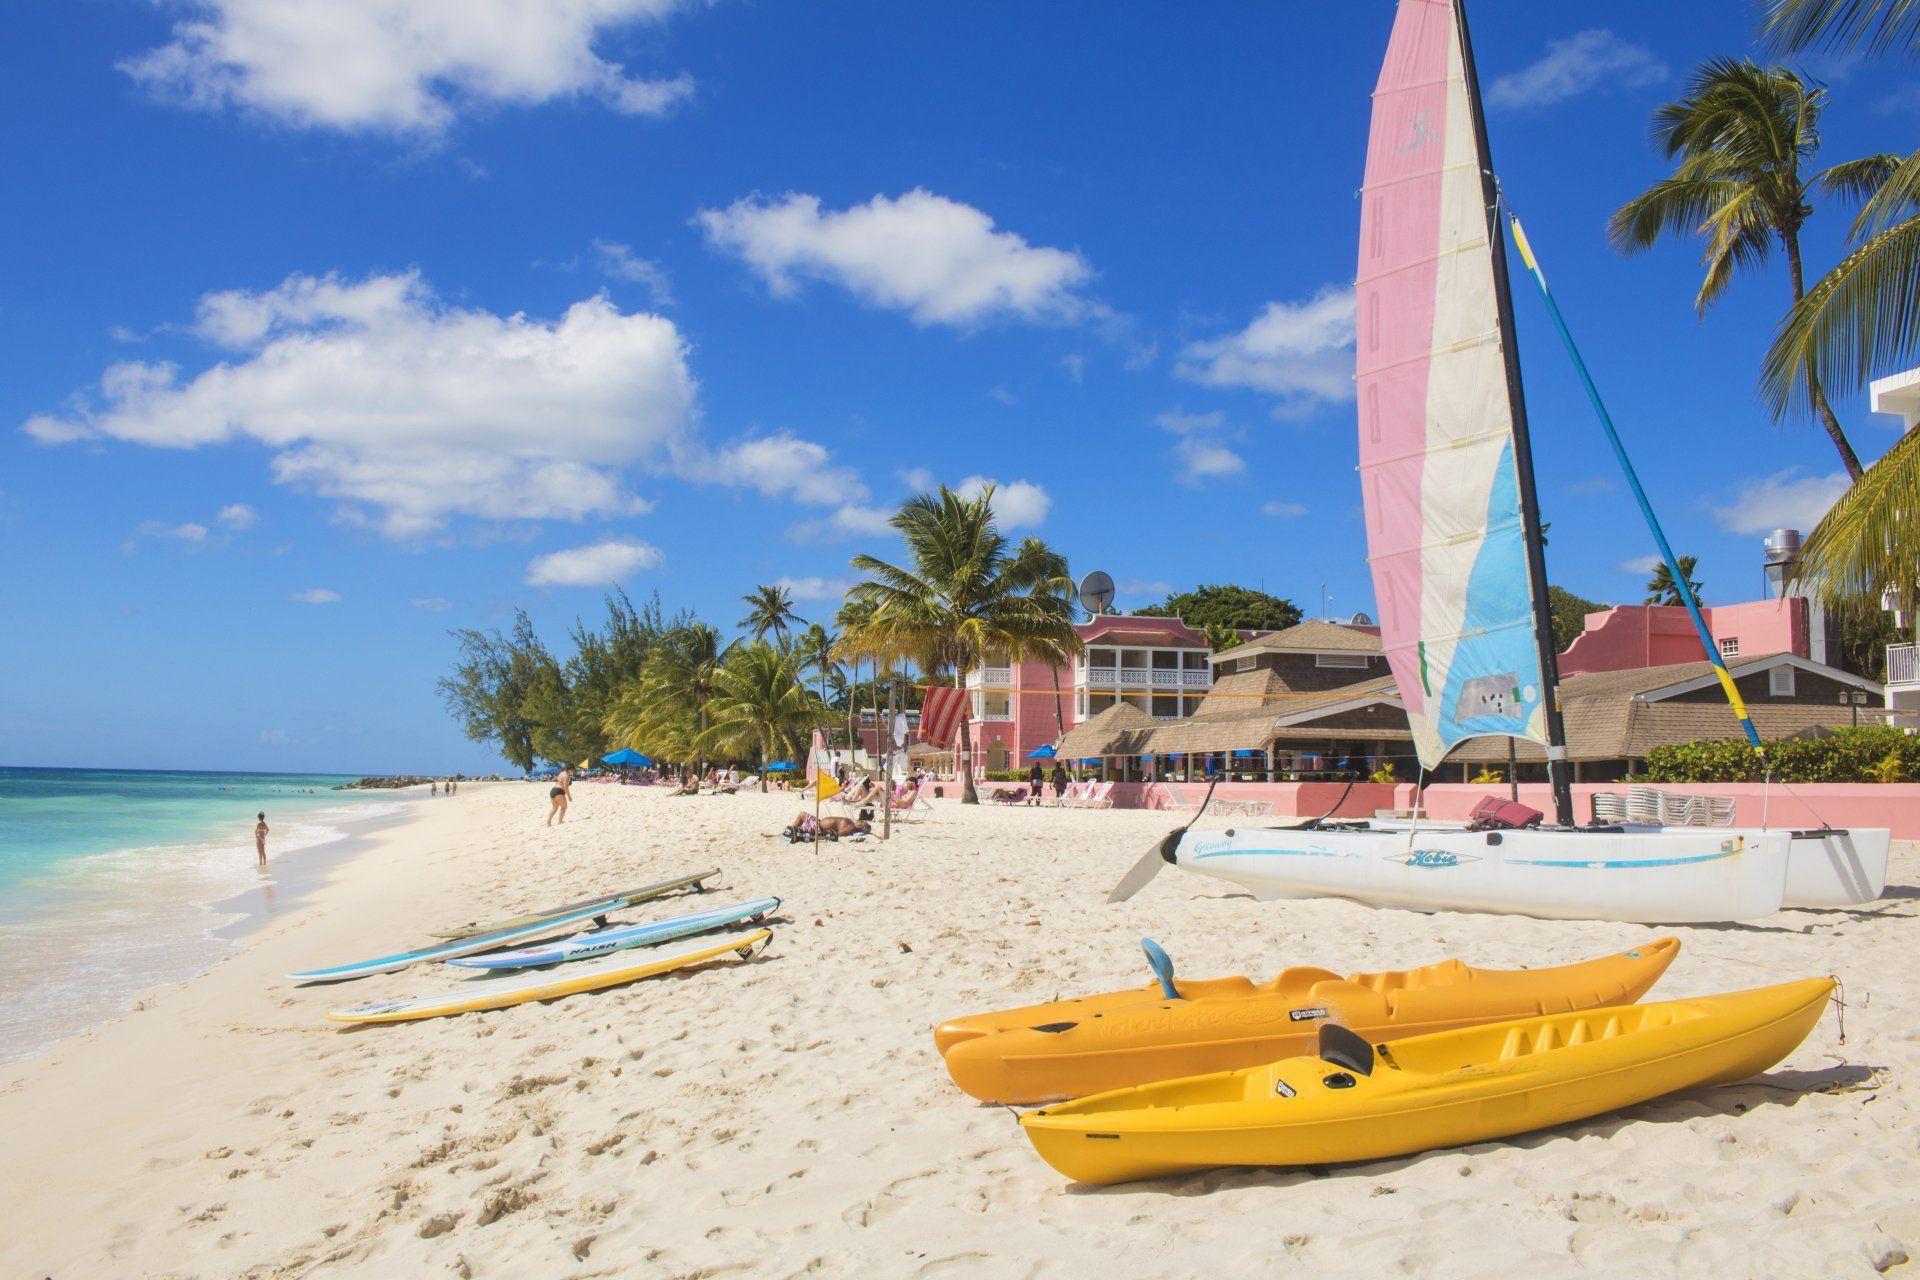 Southern Palms Barbados Things to Do